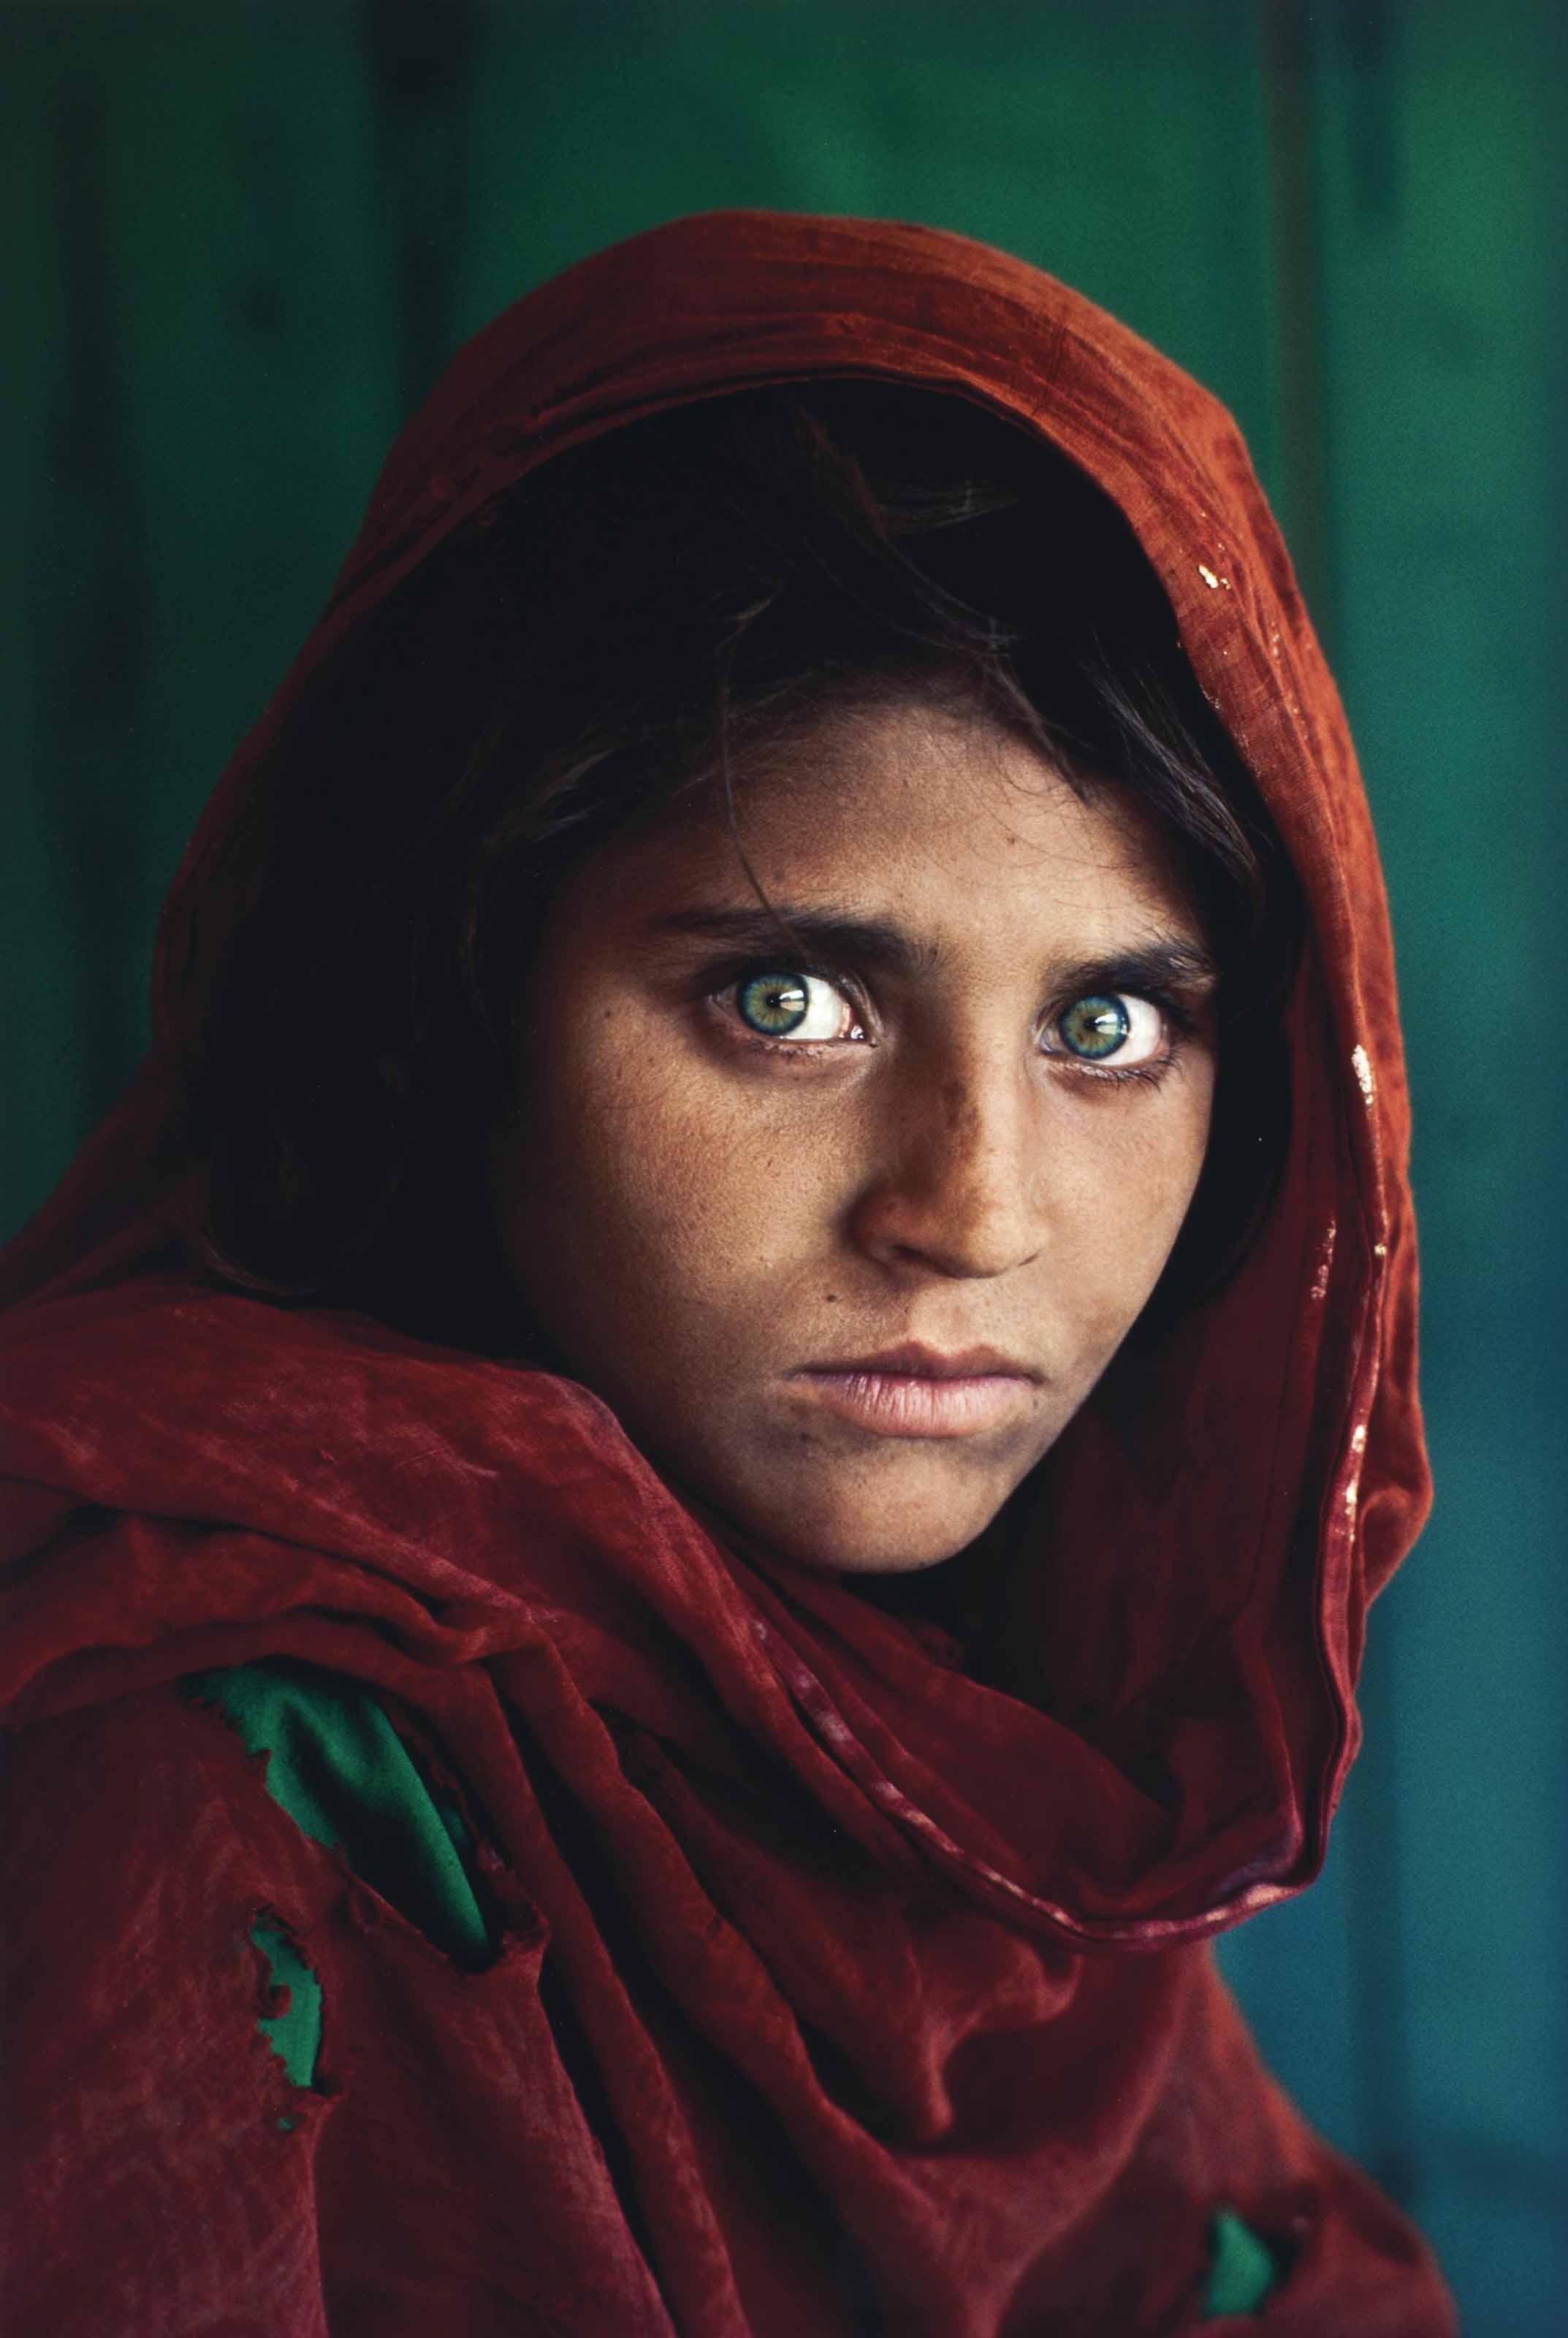 Sharbat Gula, Afghan Girl, Pakistan, 1985